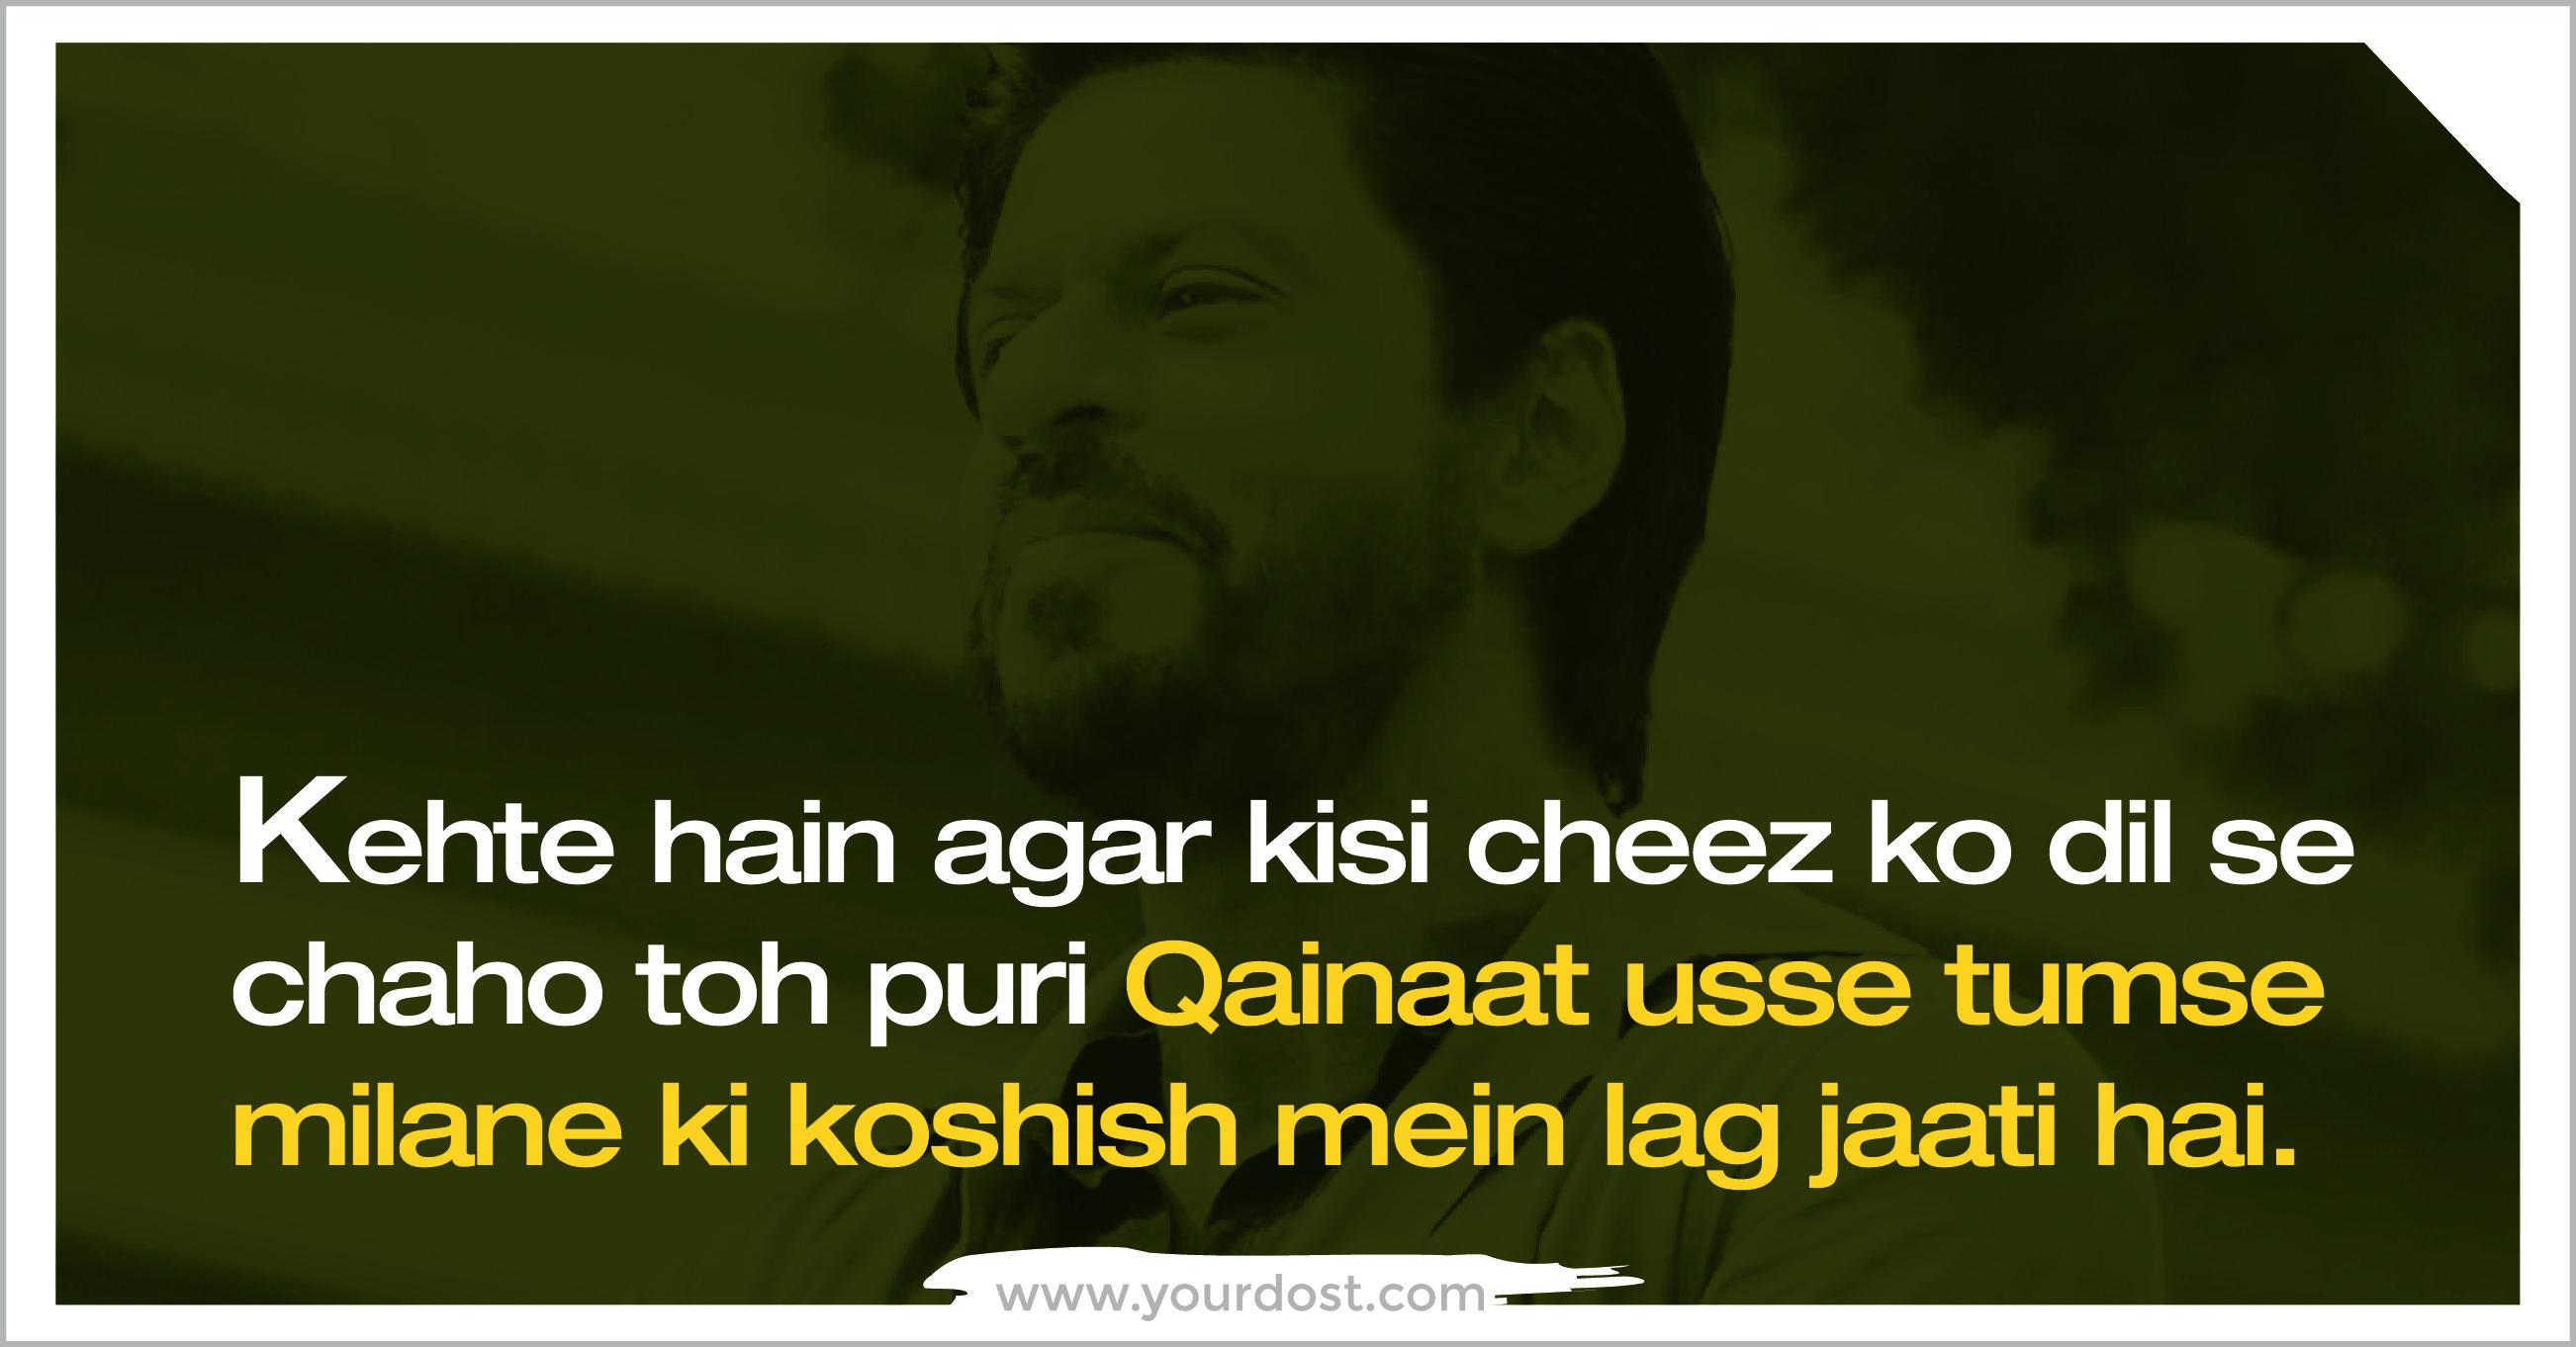 celebrity-shahrukh-khan-motivational-dialogues